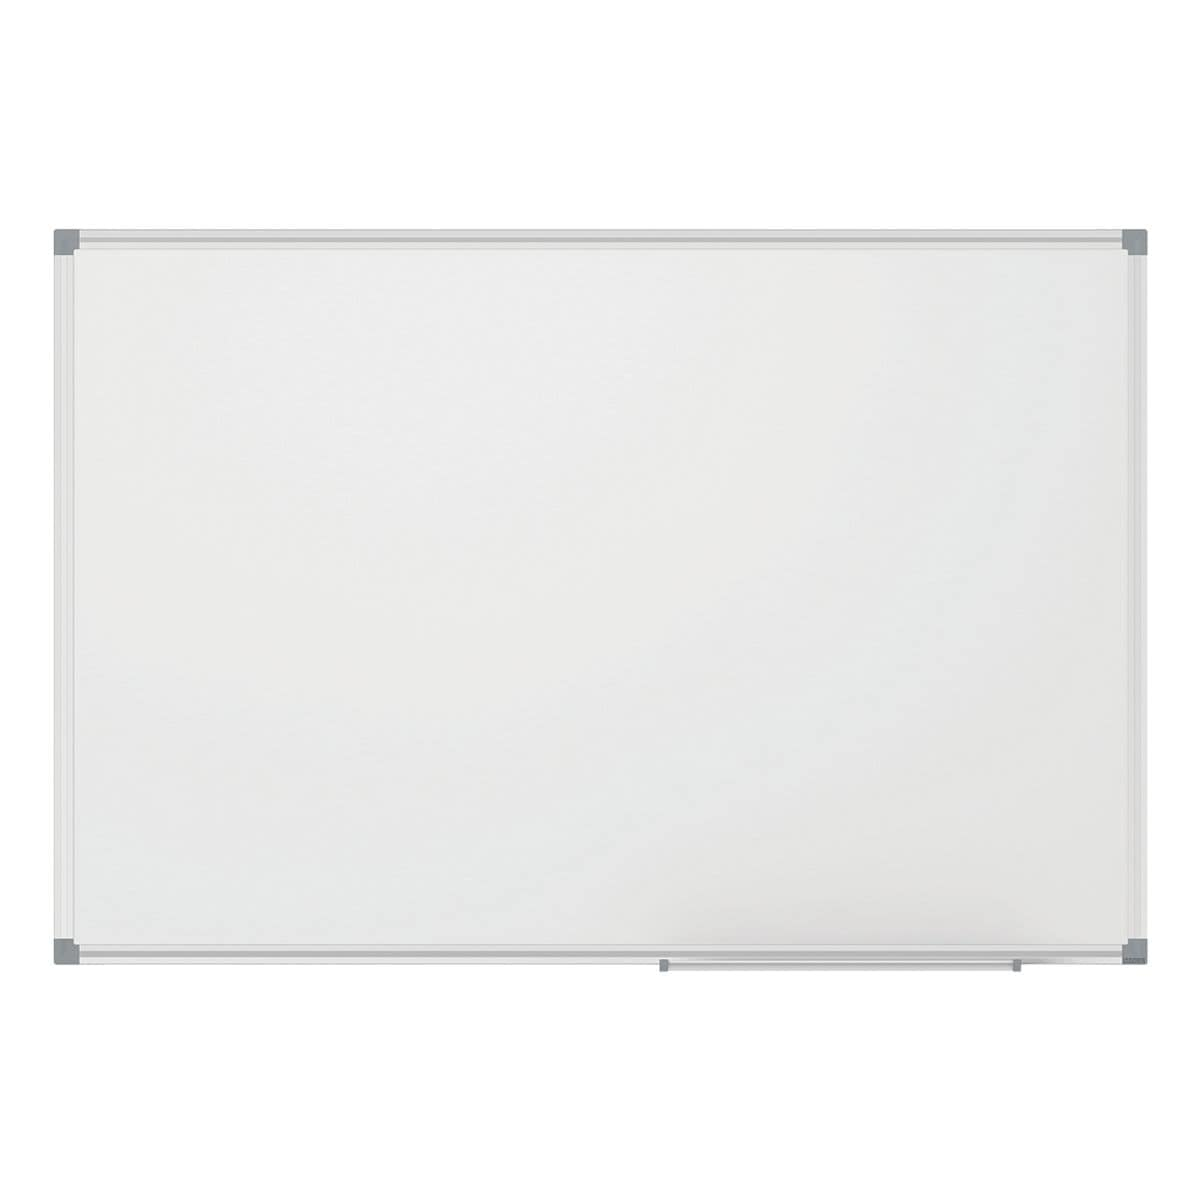 Maul Whiteboard Maulstandard 6452284 kunststoffbeschichtet, 120x90 cm